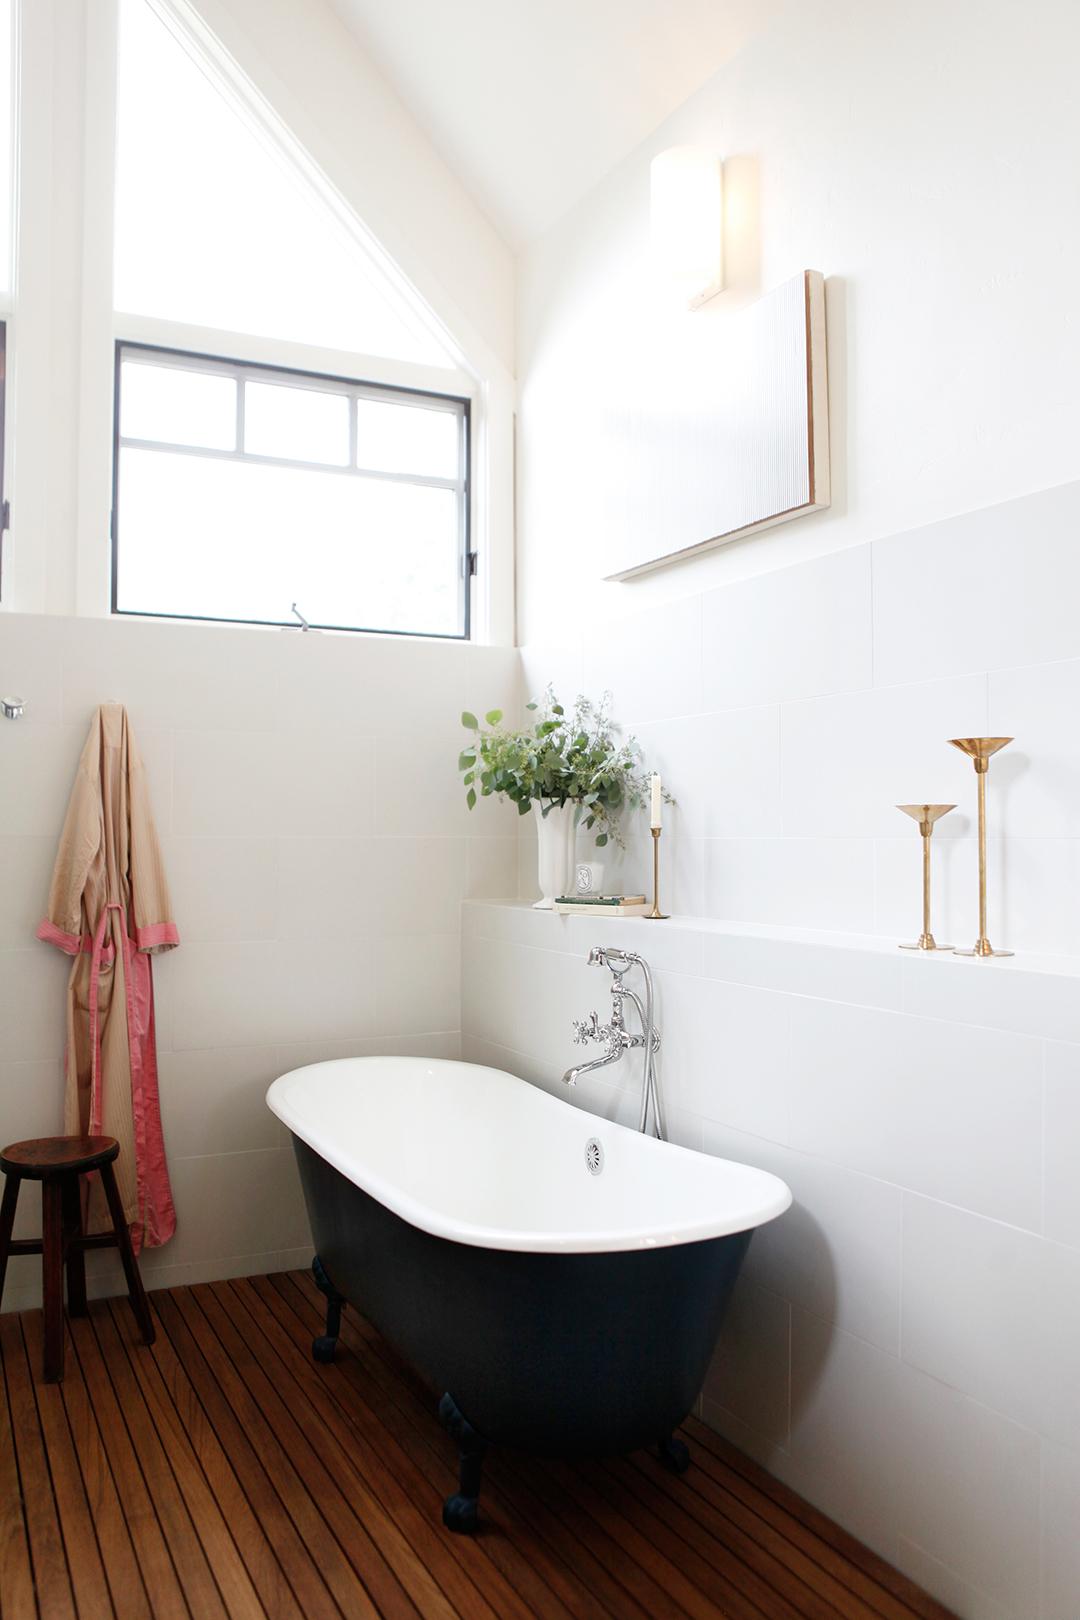 01-JGID-Sun-Valley-Bathroom-Remodel.JPG